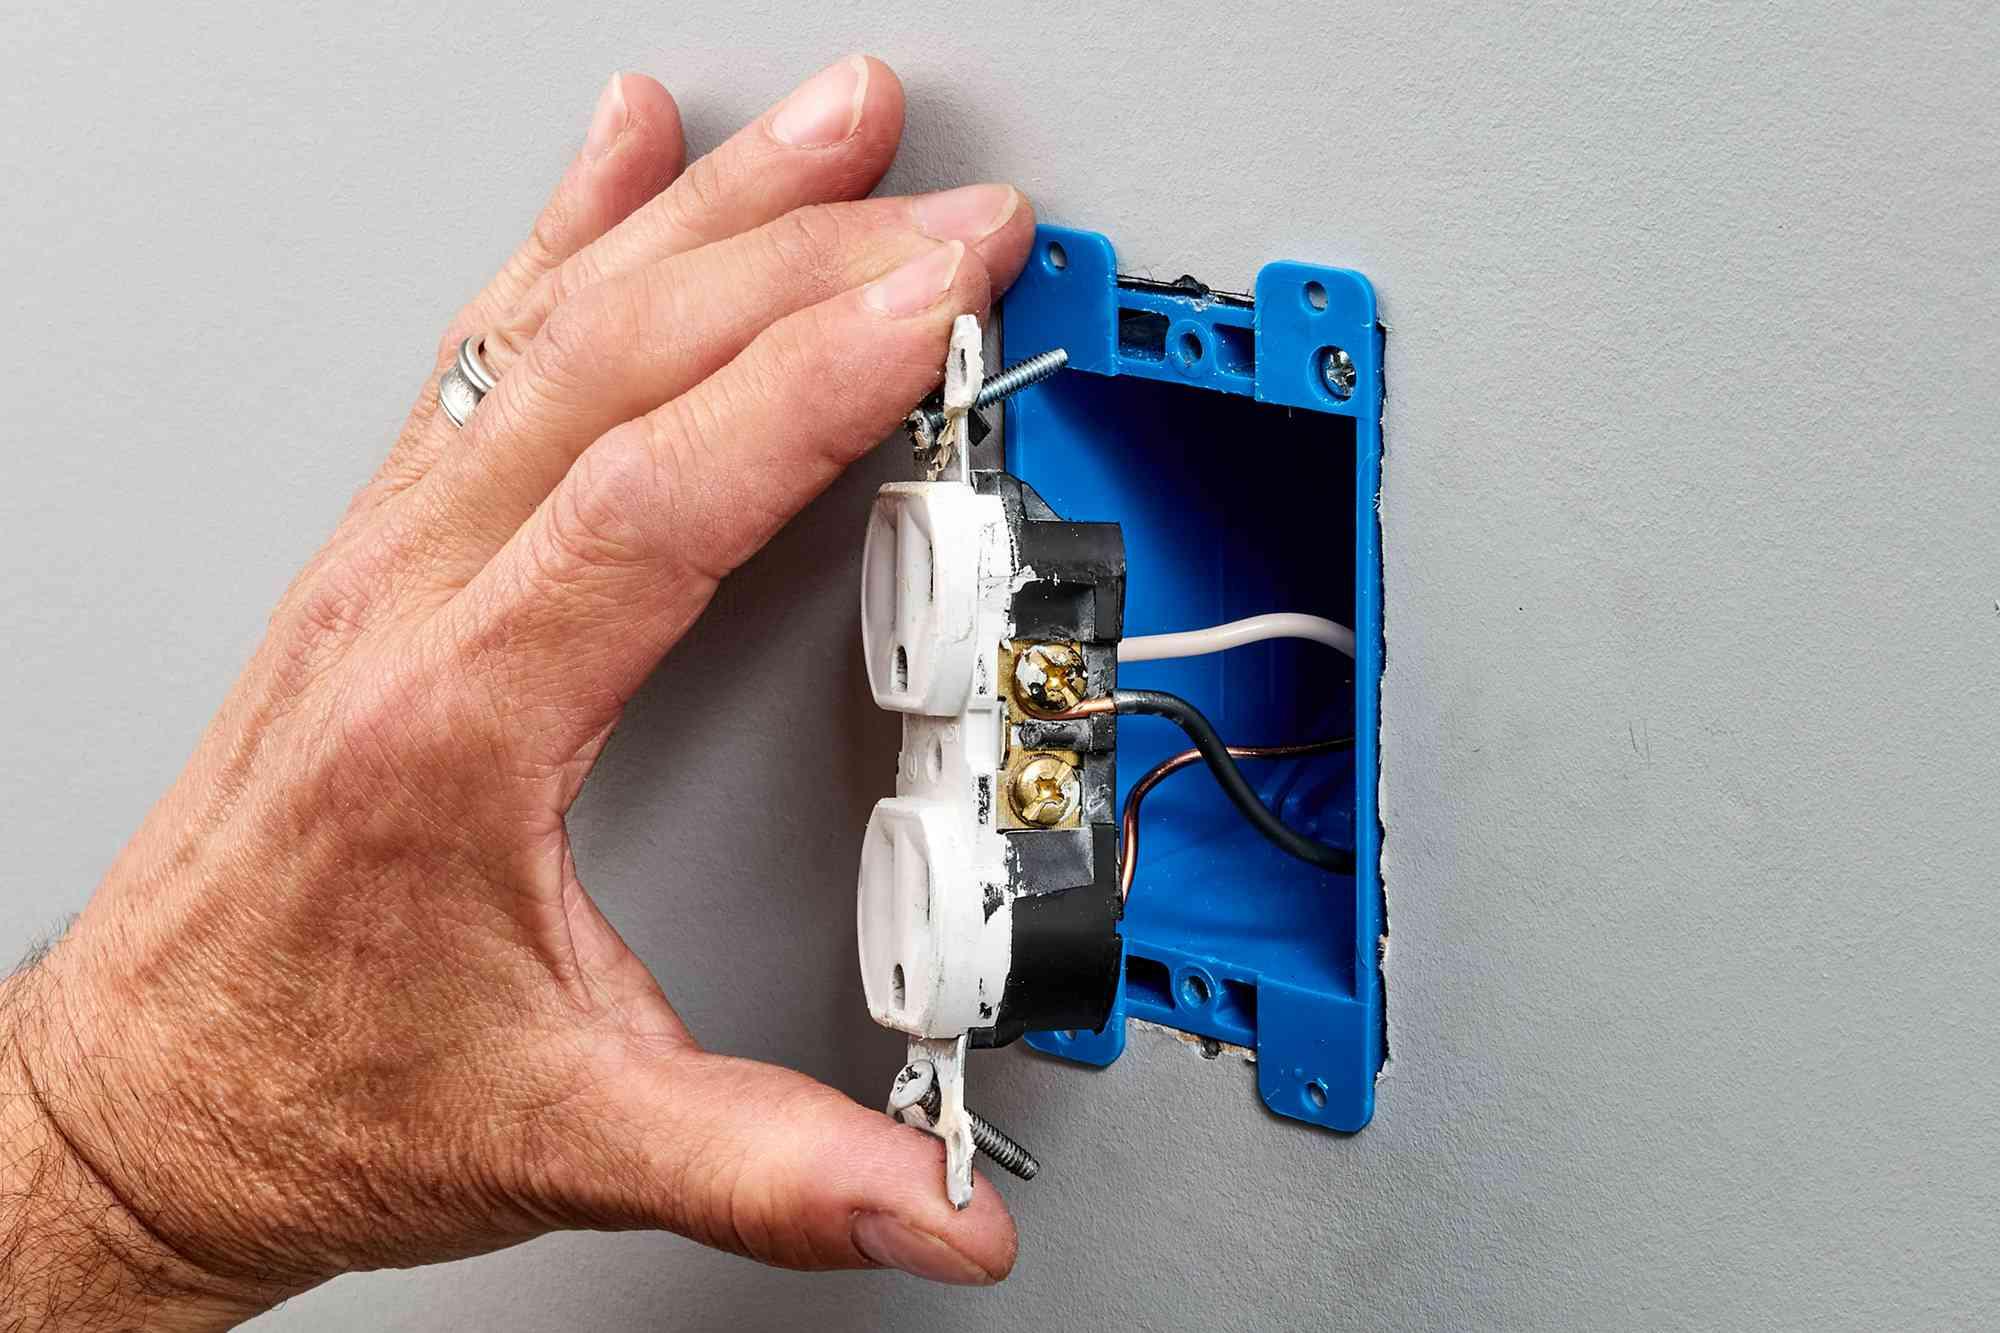 Receptacle held by metal strap to examine wiring